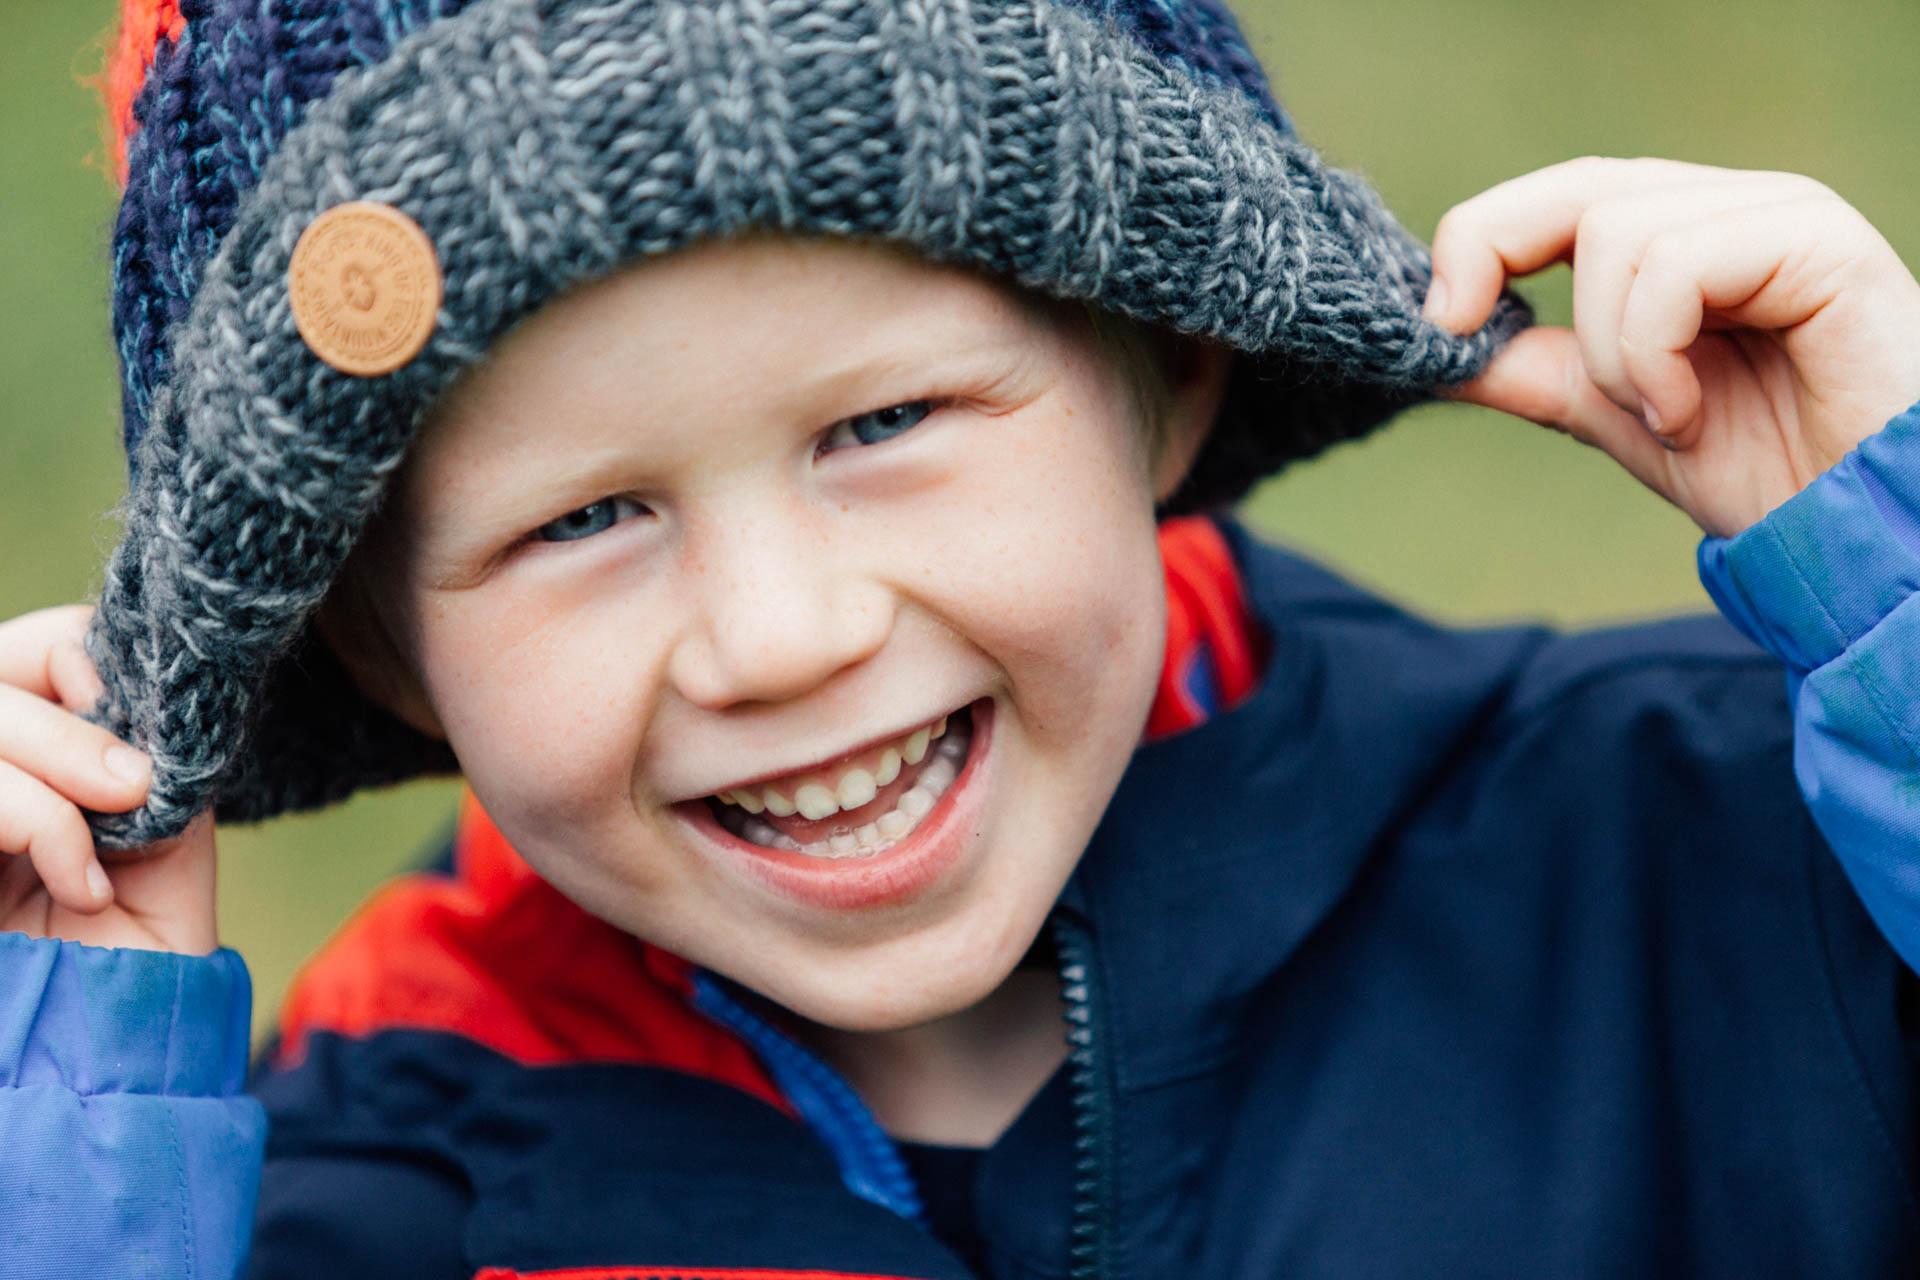 Children Family Photography by Ricky Parker Photography 2